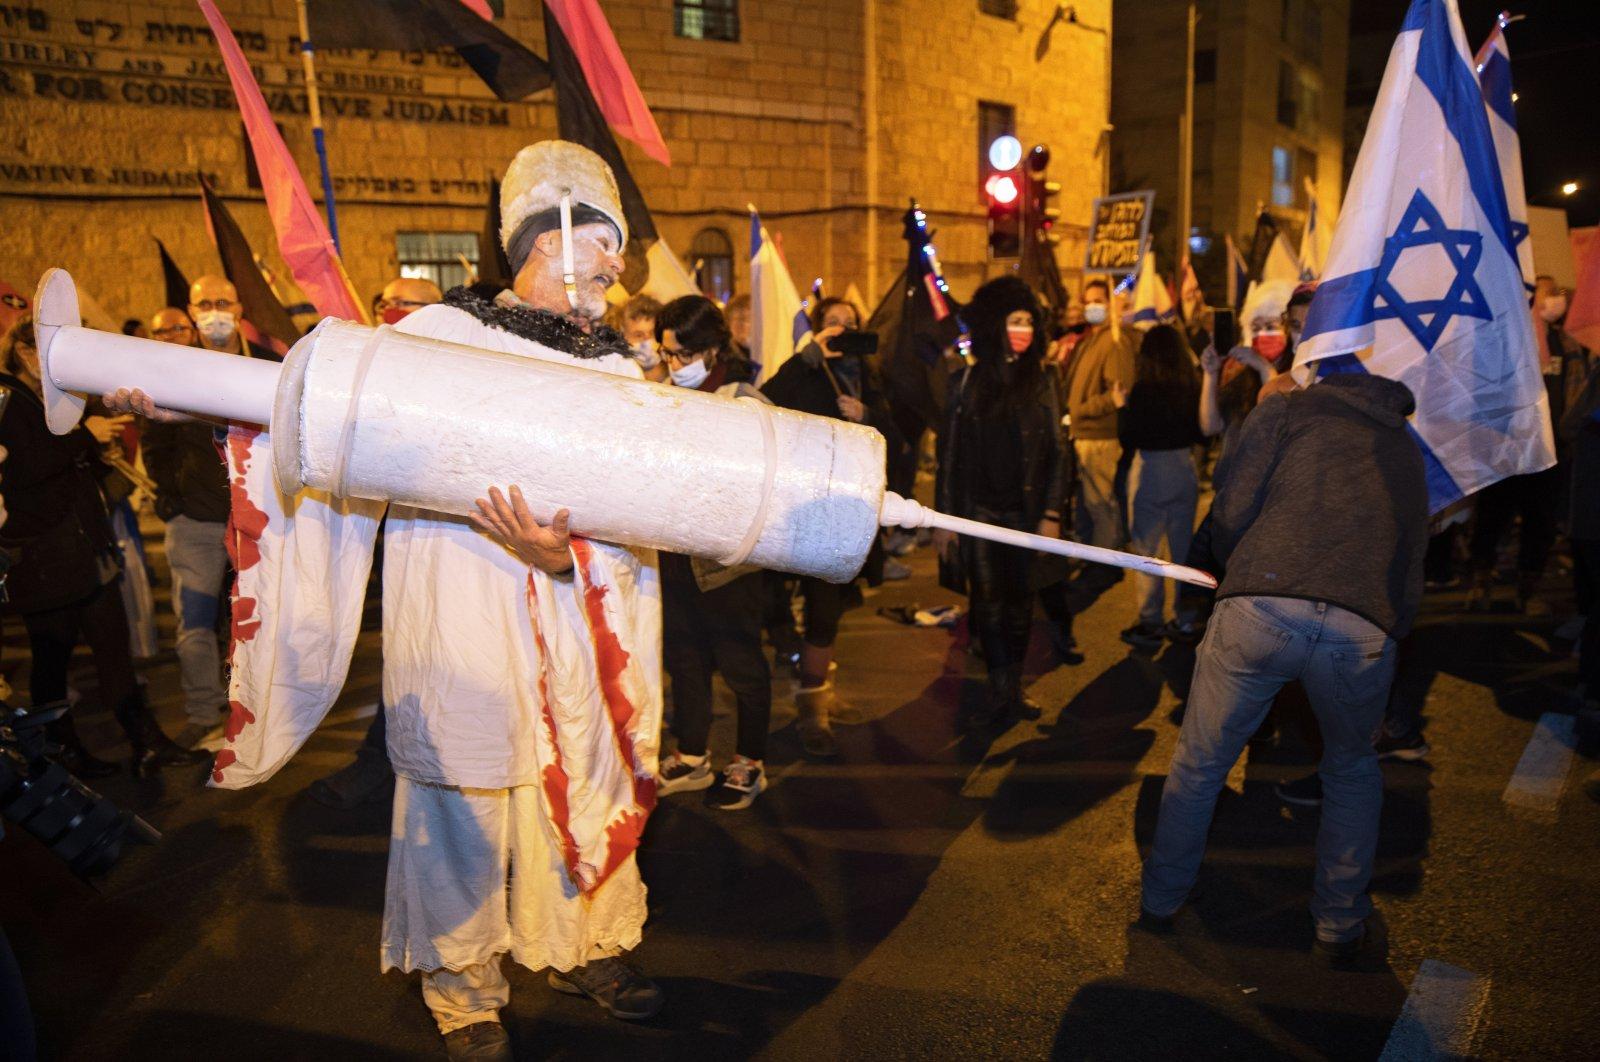 An Israeli protester holds a giant syringe during a demonstration against Israeli Prime Minister Benjamin Netanyahu near his official residence during the third nationwide coronavirus lockdown, Jerusalem, Jan. 9, 2021. (AP Photo)